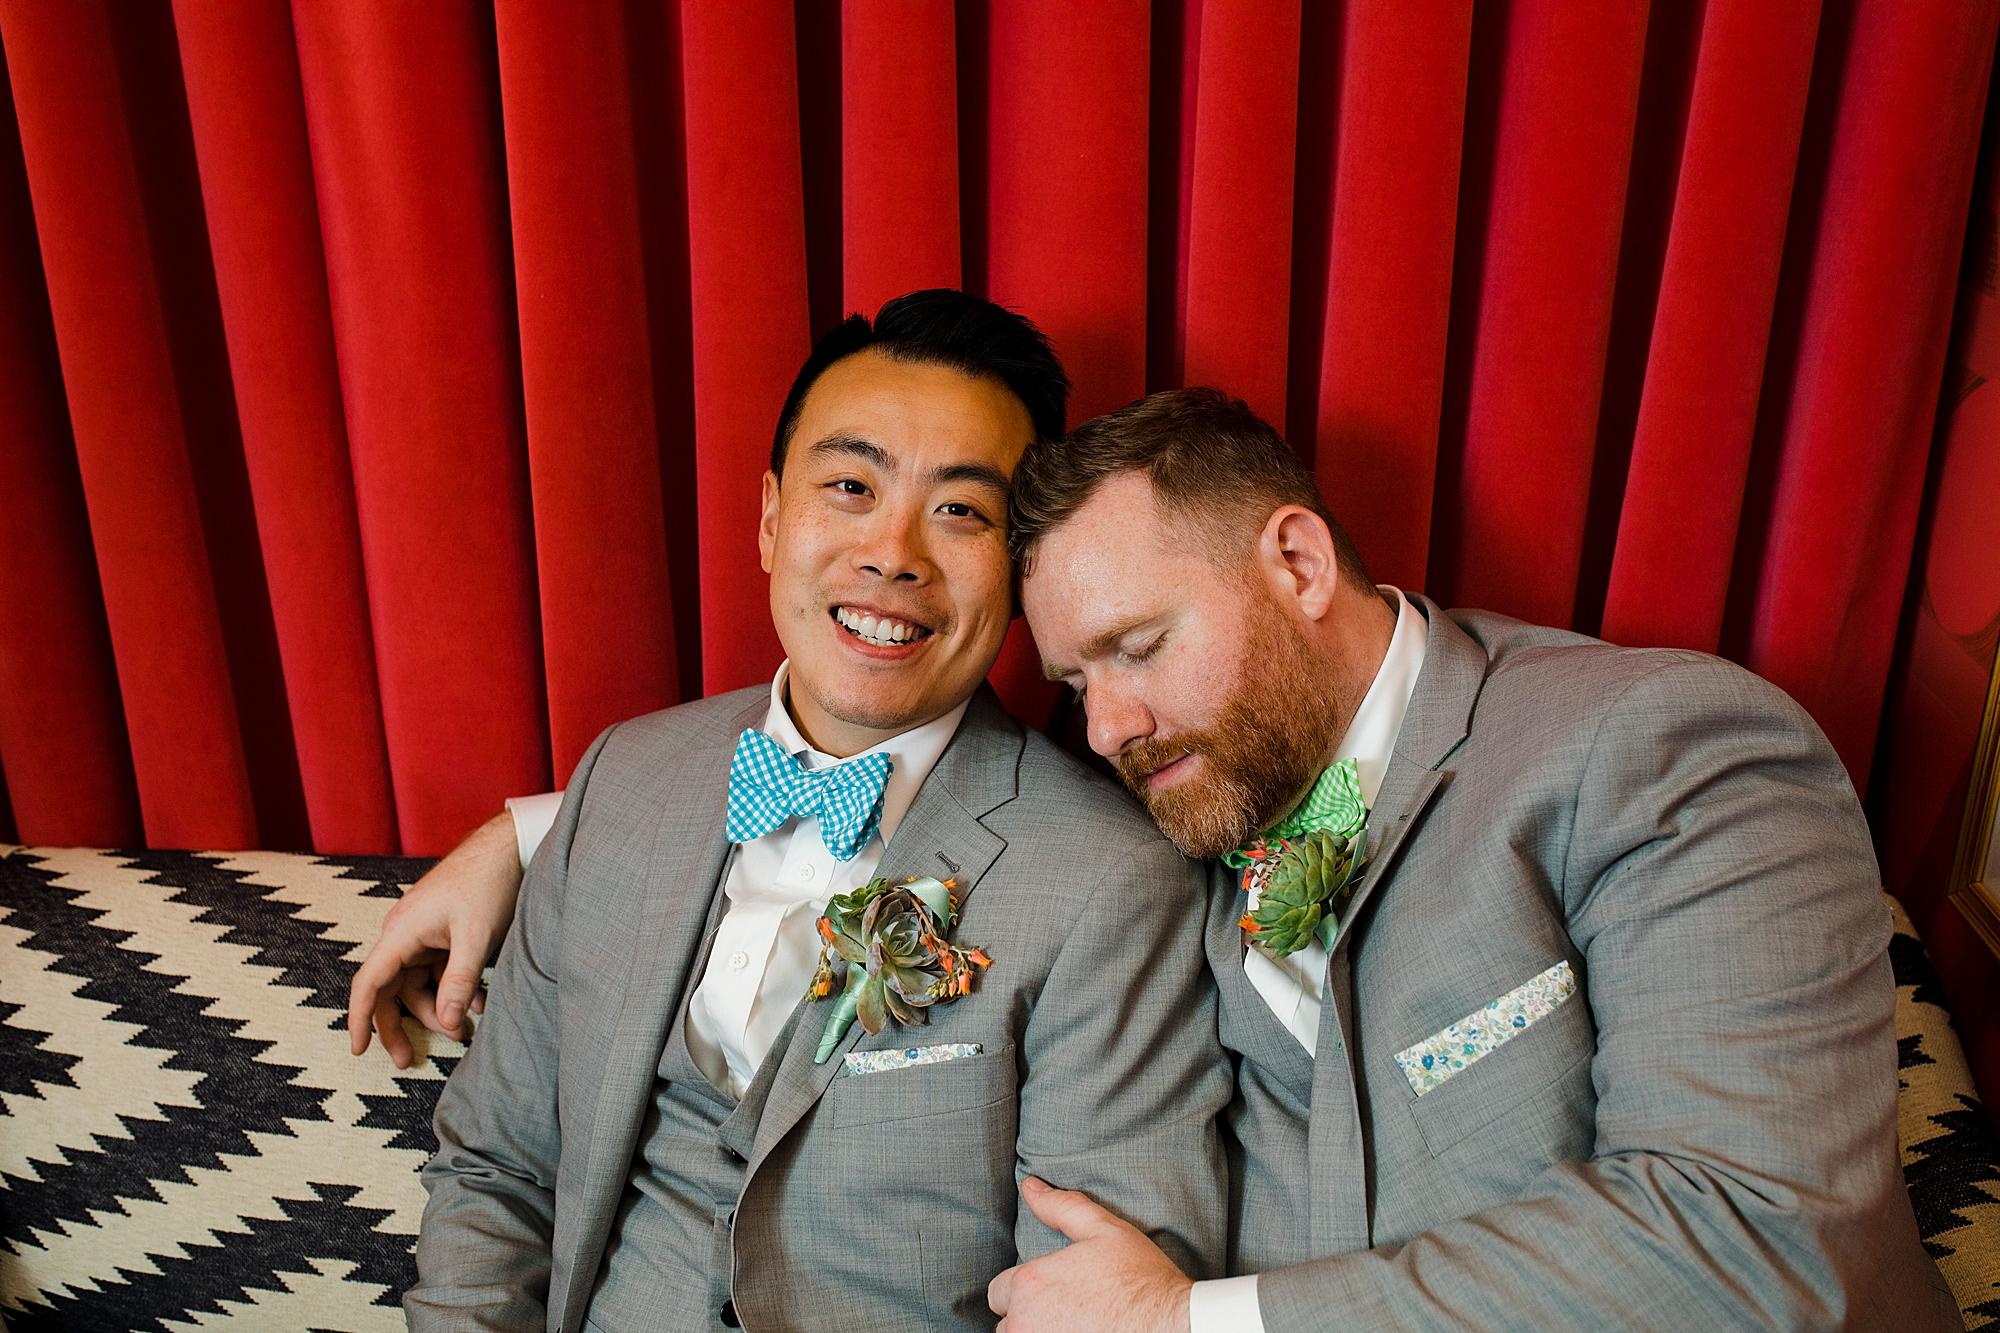 Dan_and_Byron_Love_by_Joe_Mac_Philadelphia_Wedding_LGBTQ_Photography_Gay_Independence_visitor_Center_58.JPG